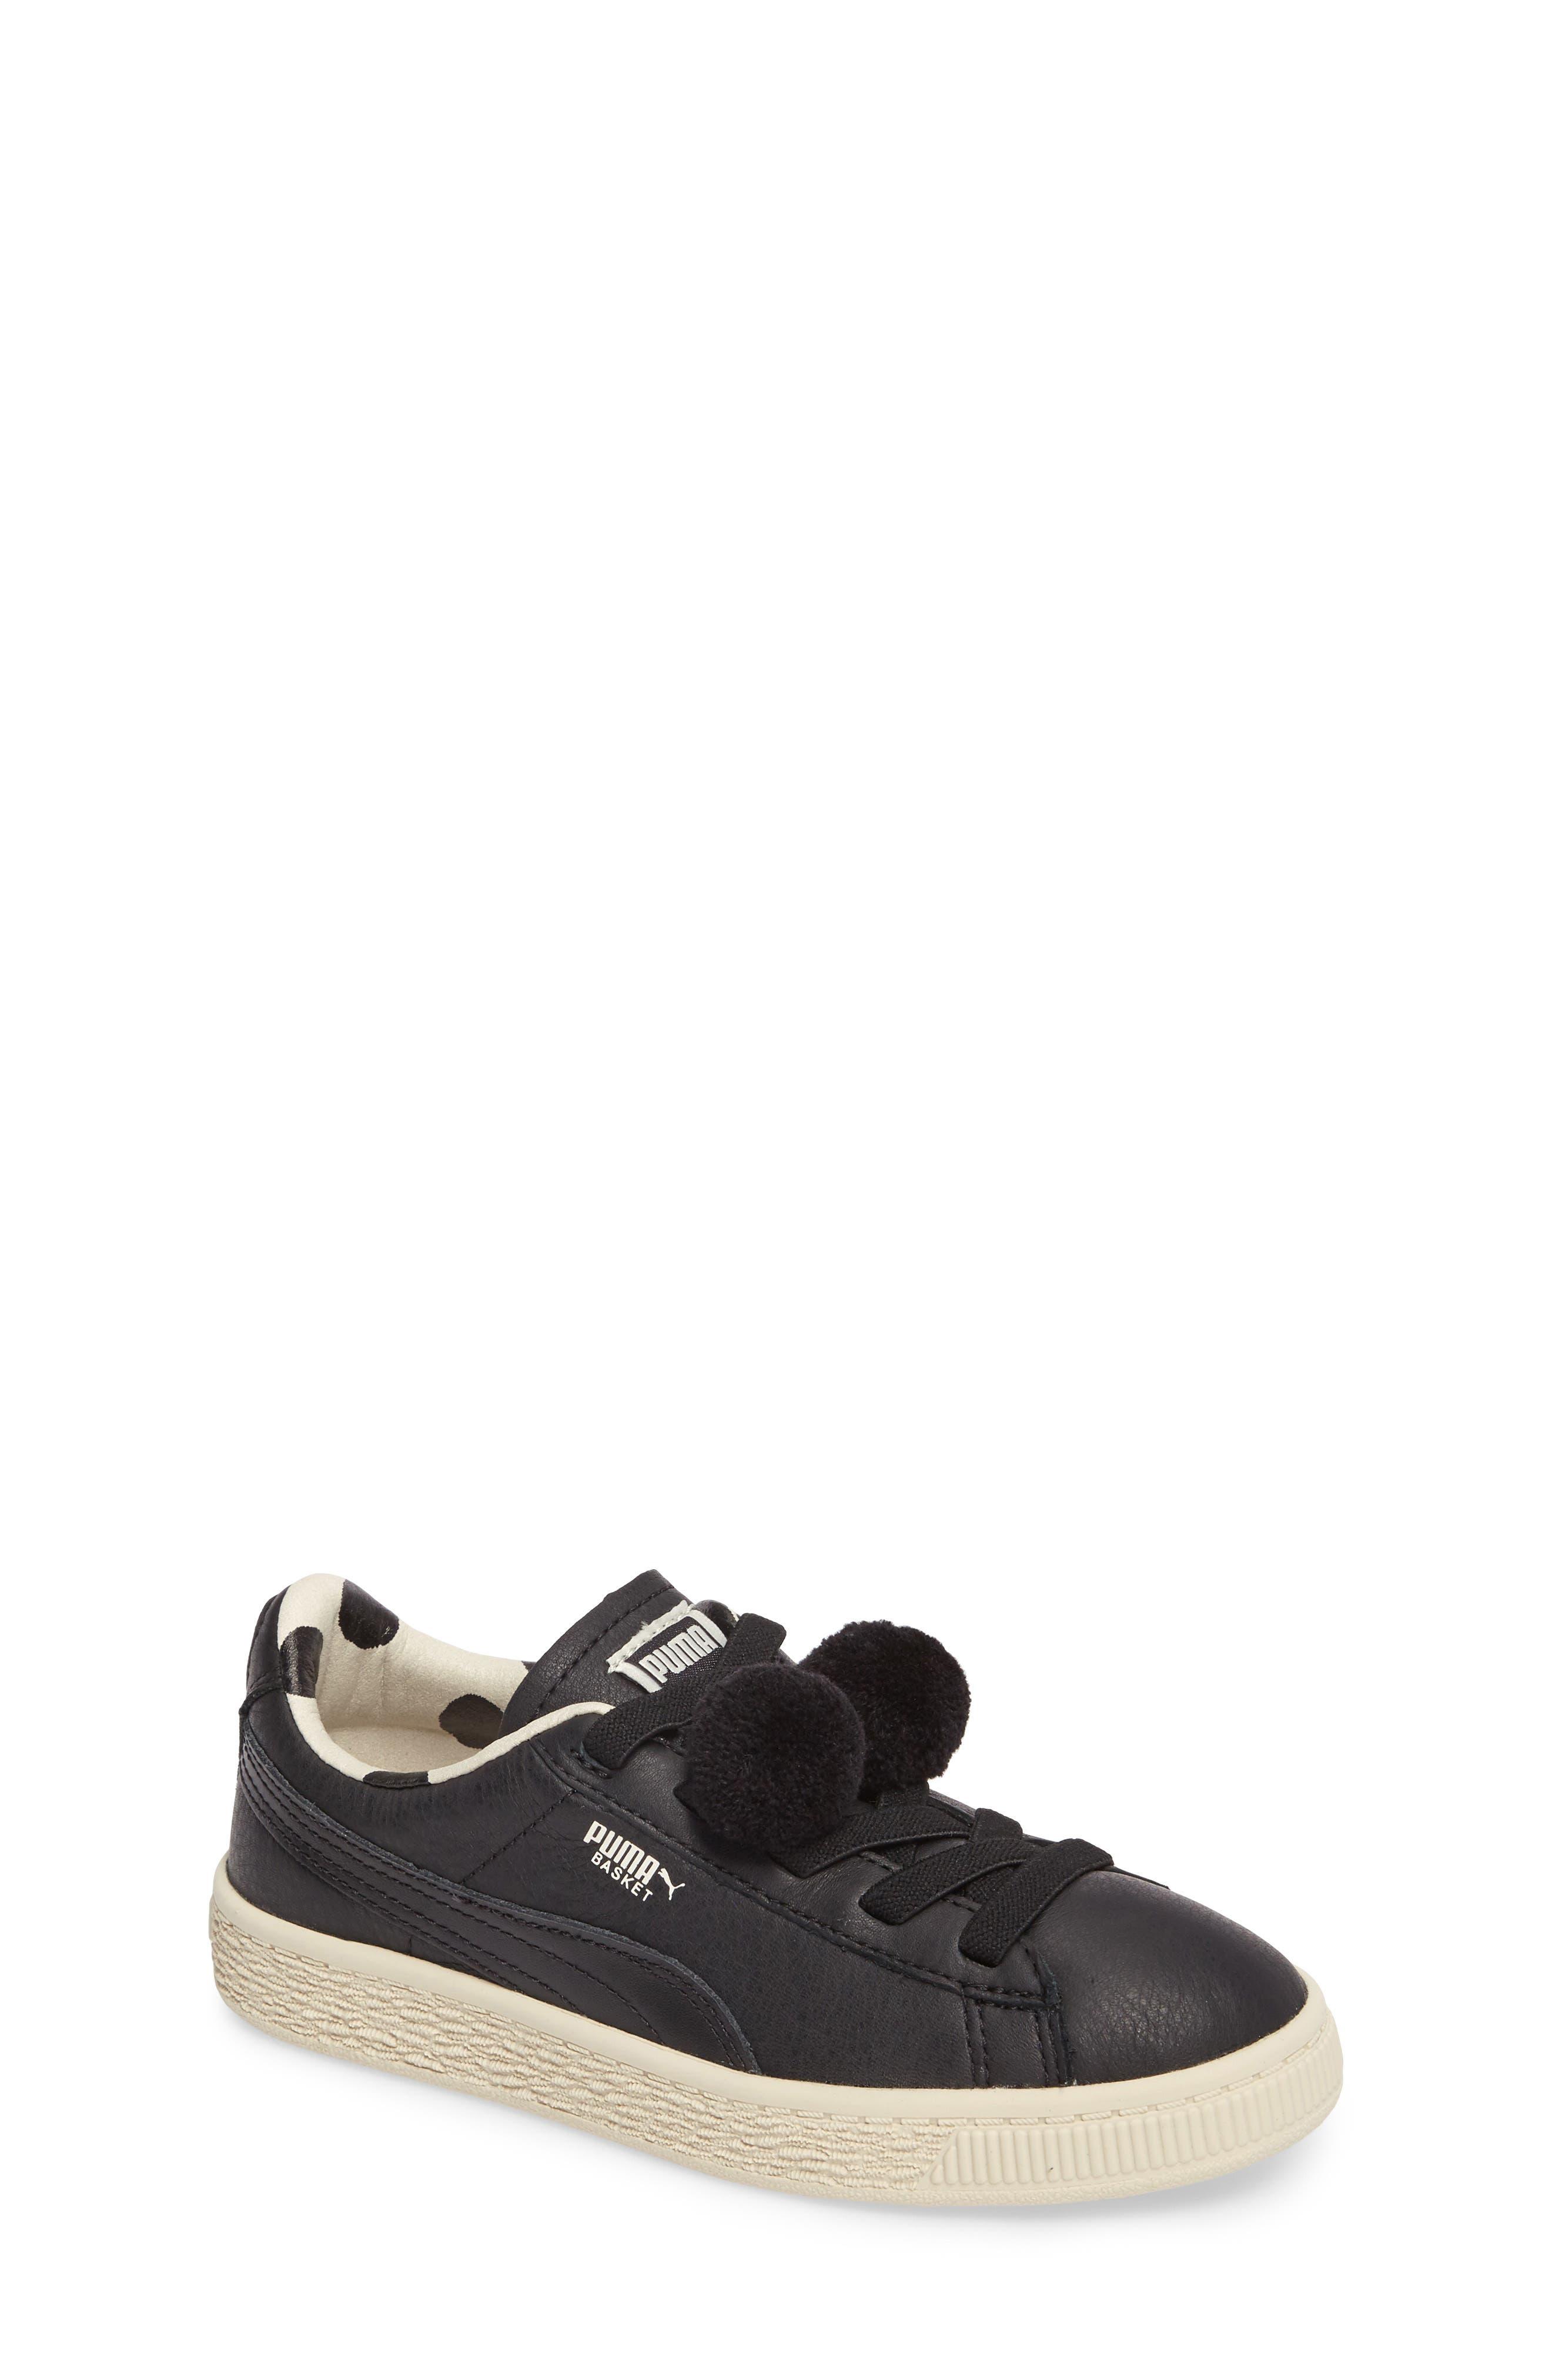 x tinycottons Basket Pompom Sneaker,                         Main,                         color, 001